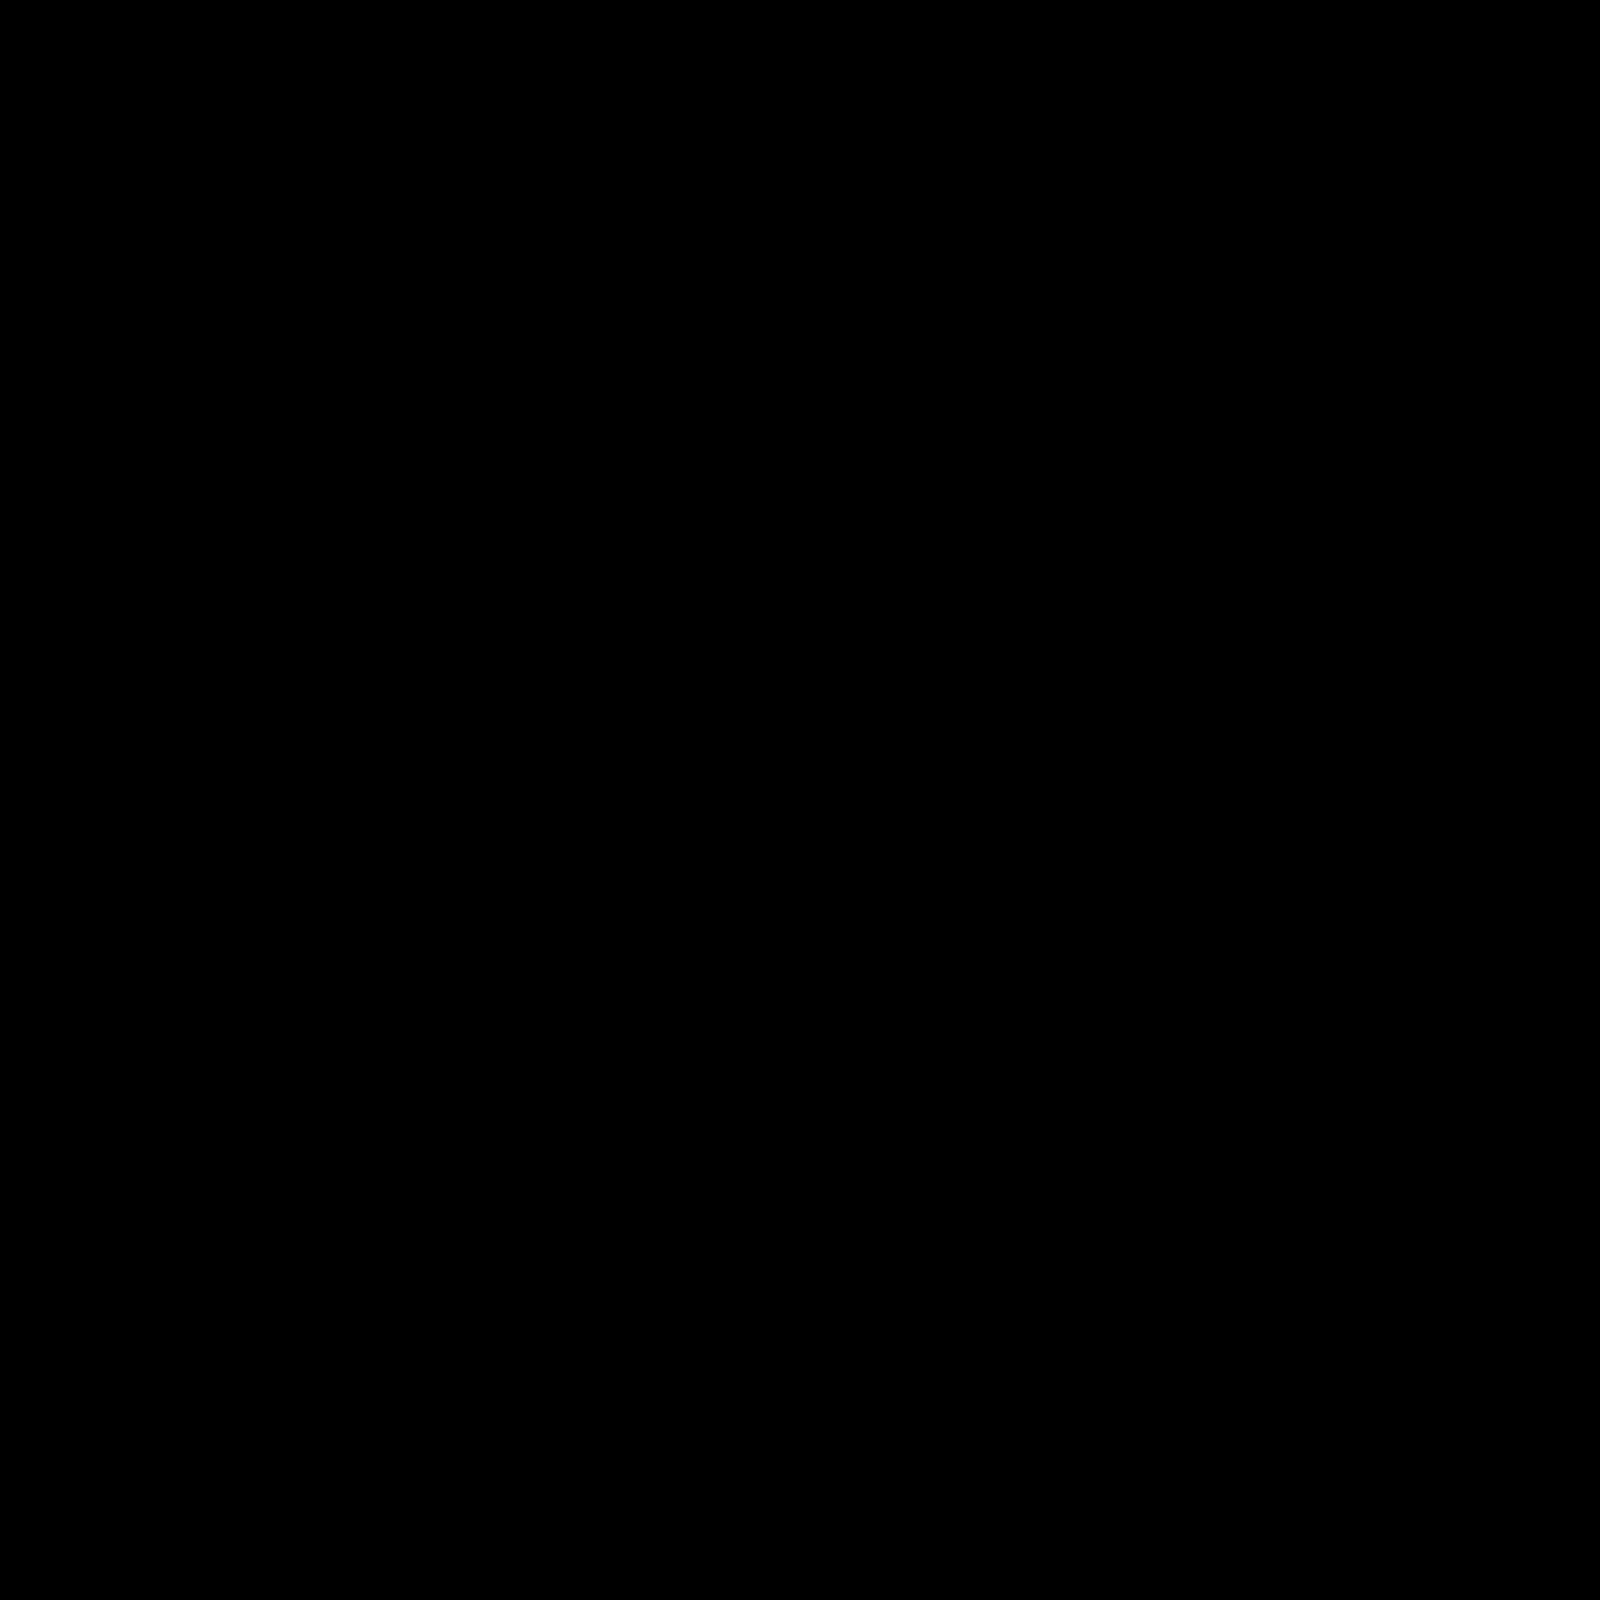 Wildcat Paw 2 SVG Clip arts